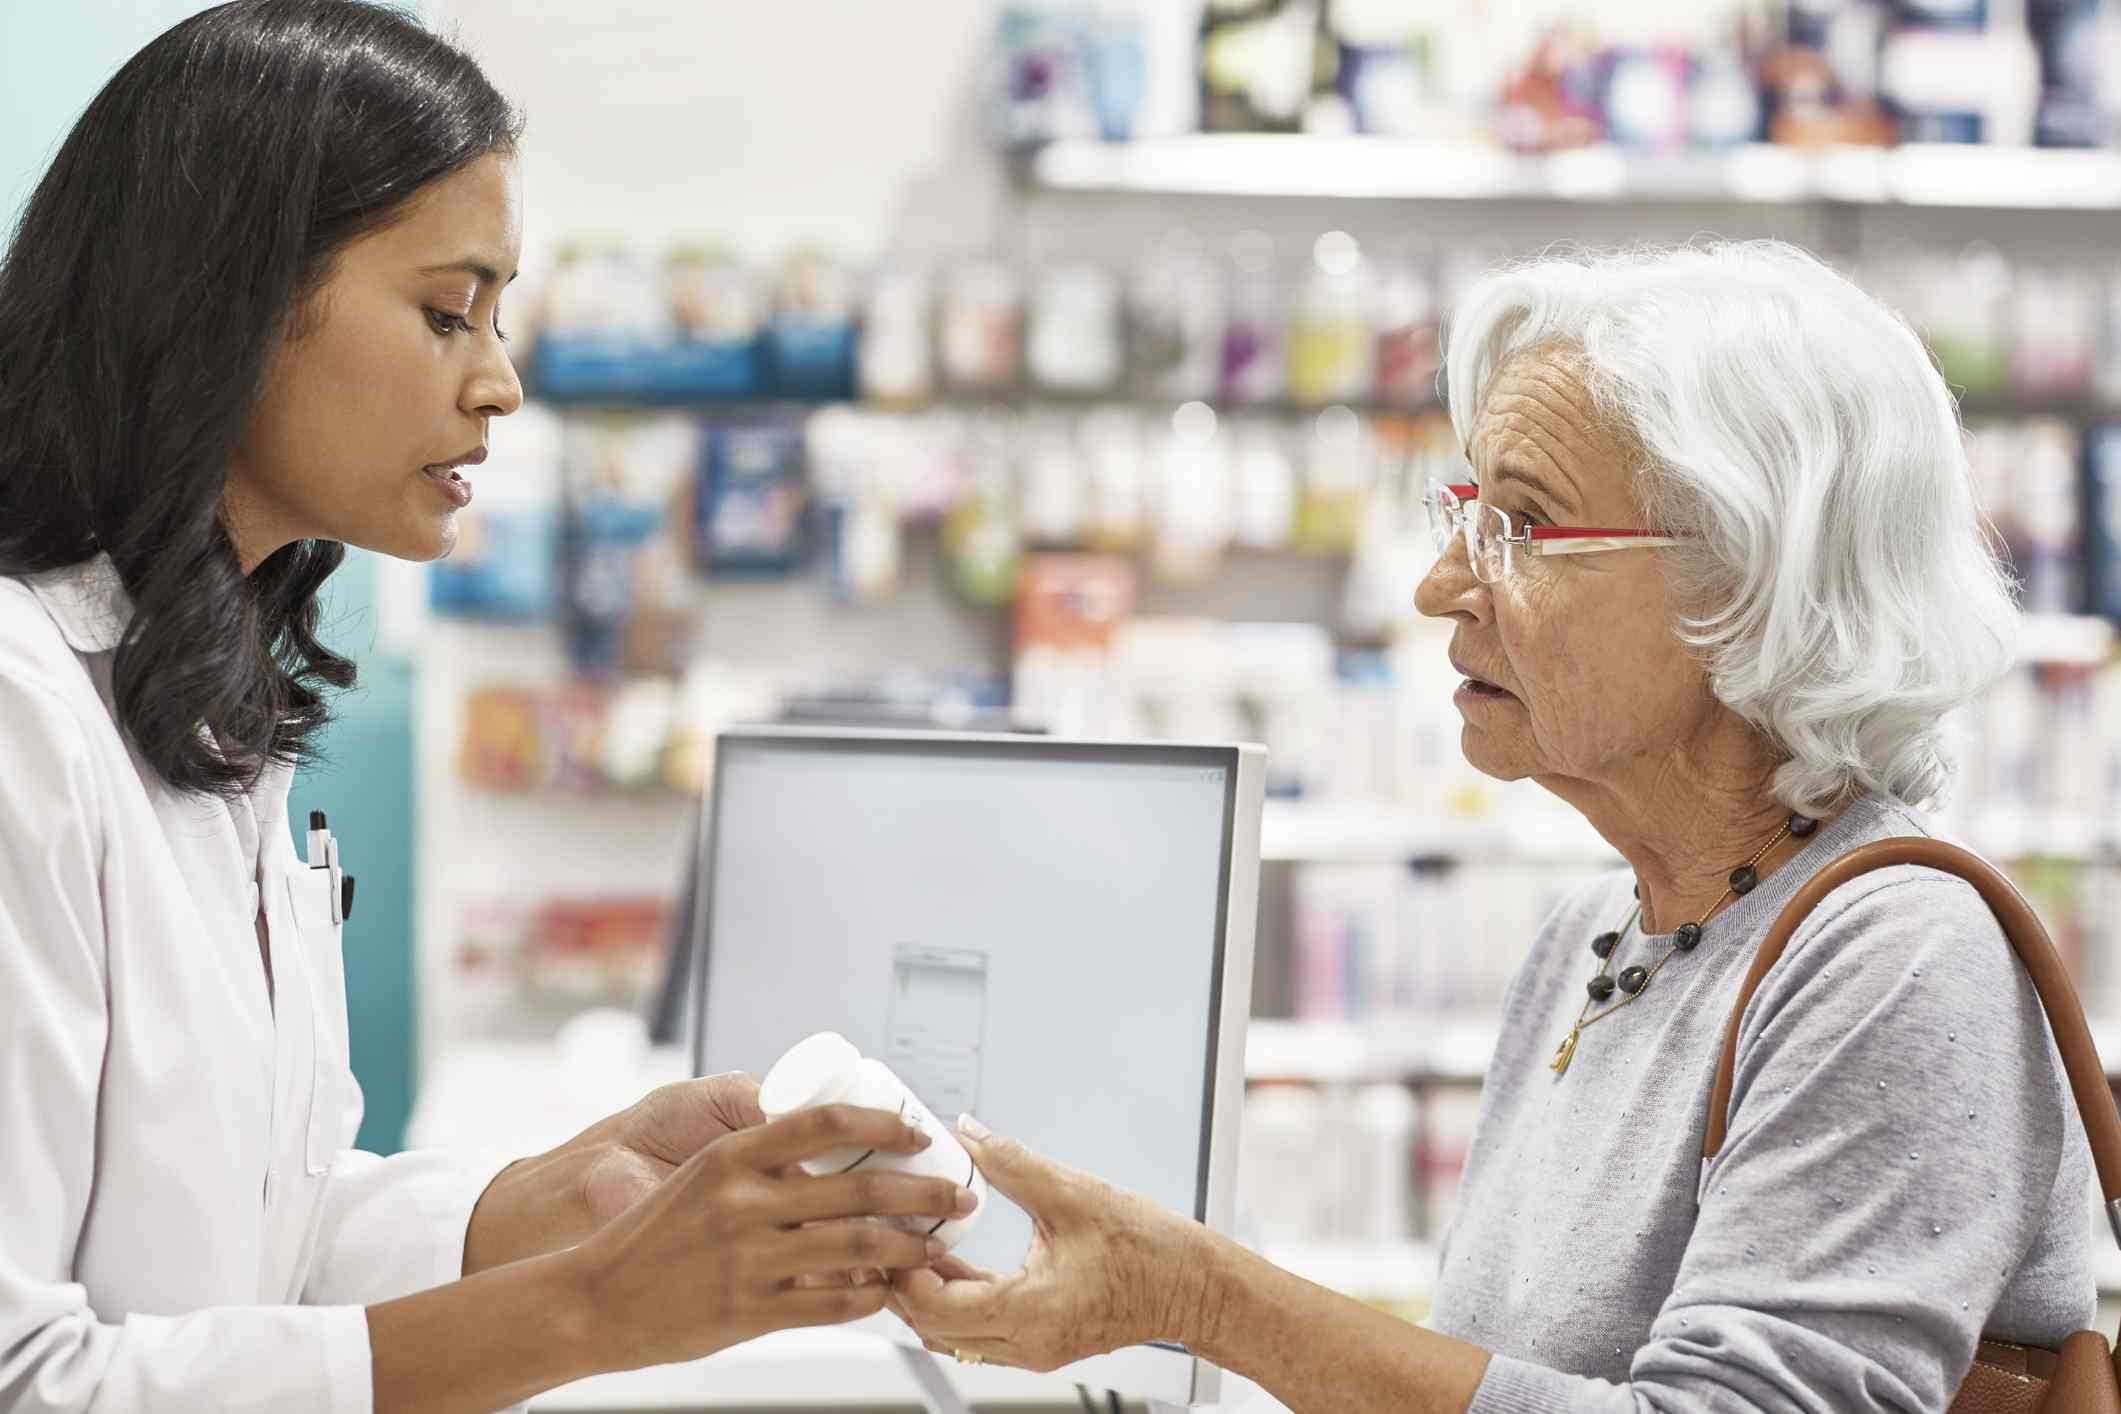 Pharmacist advises woman on drug interactions